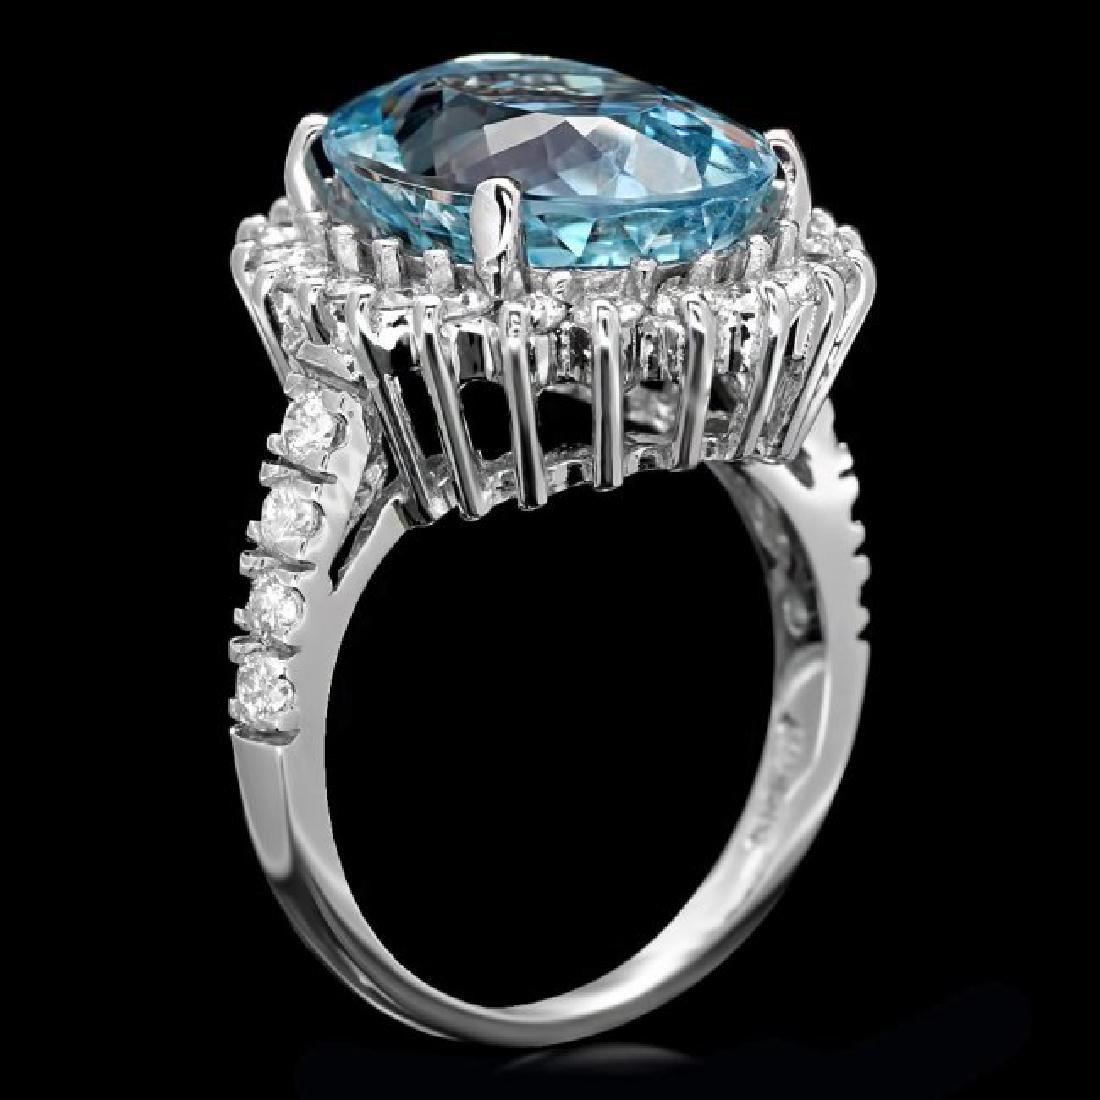 14k Gold 7.50ct Aquamarine 1.00ct Diamond Ring - 3